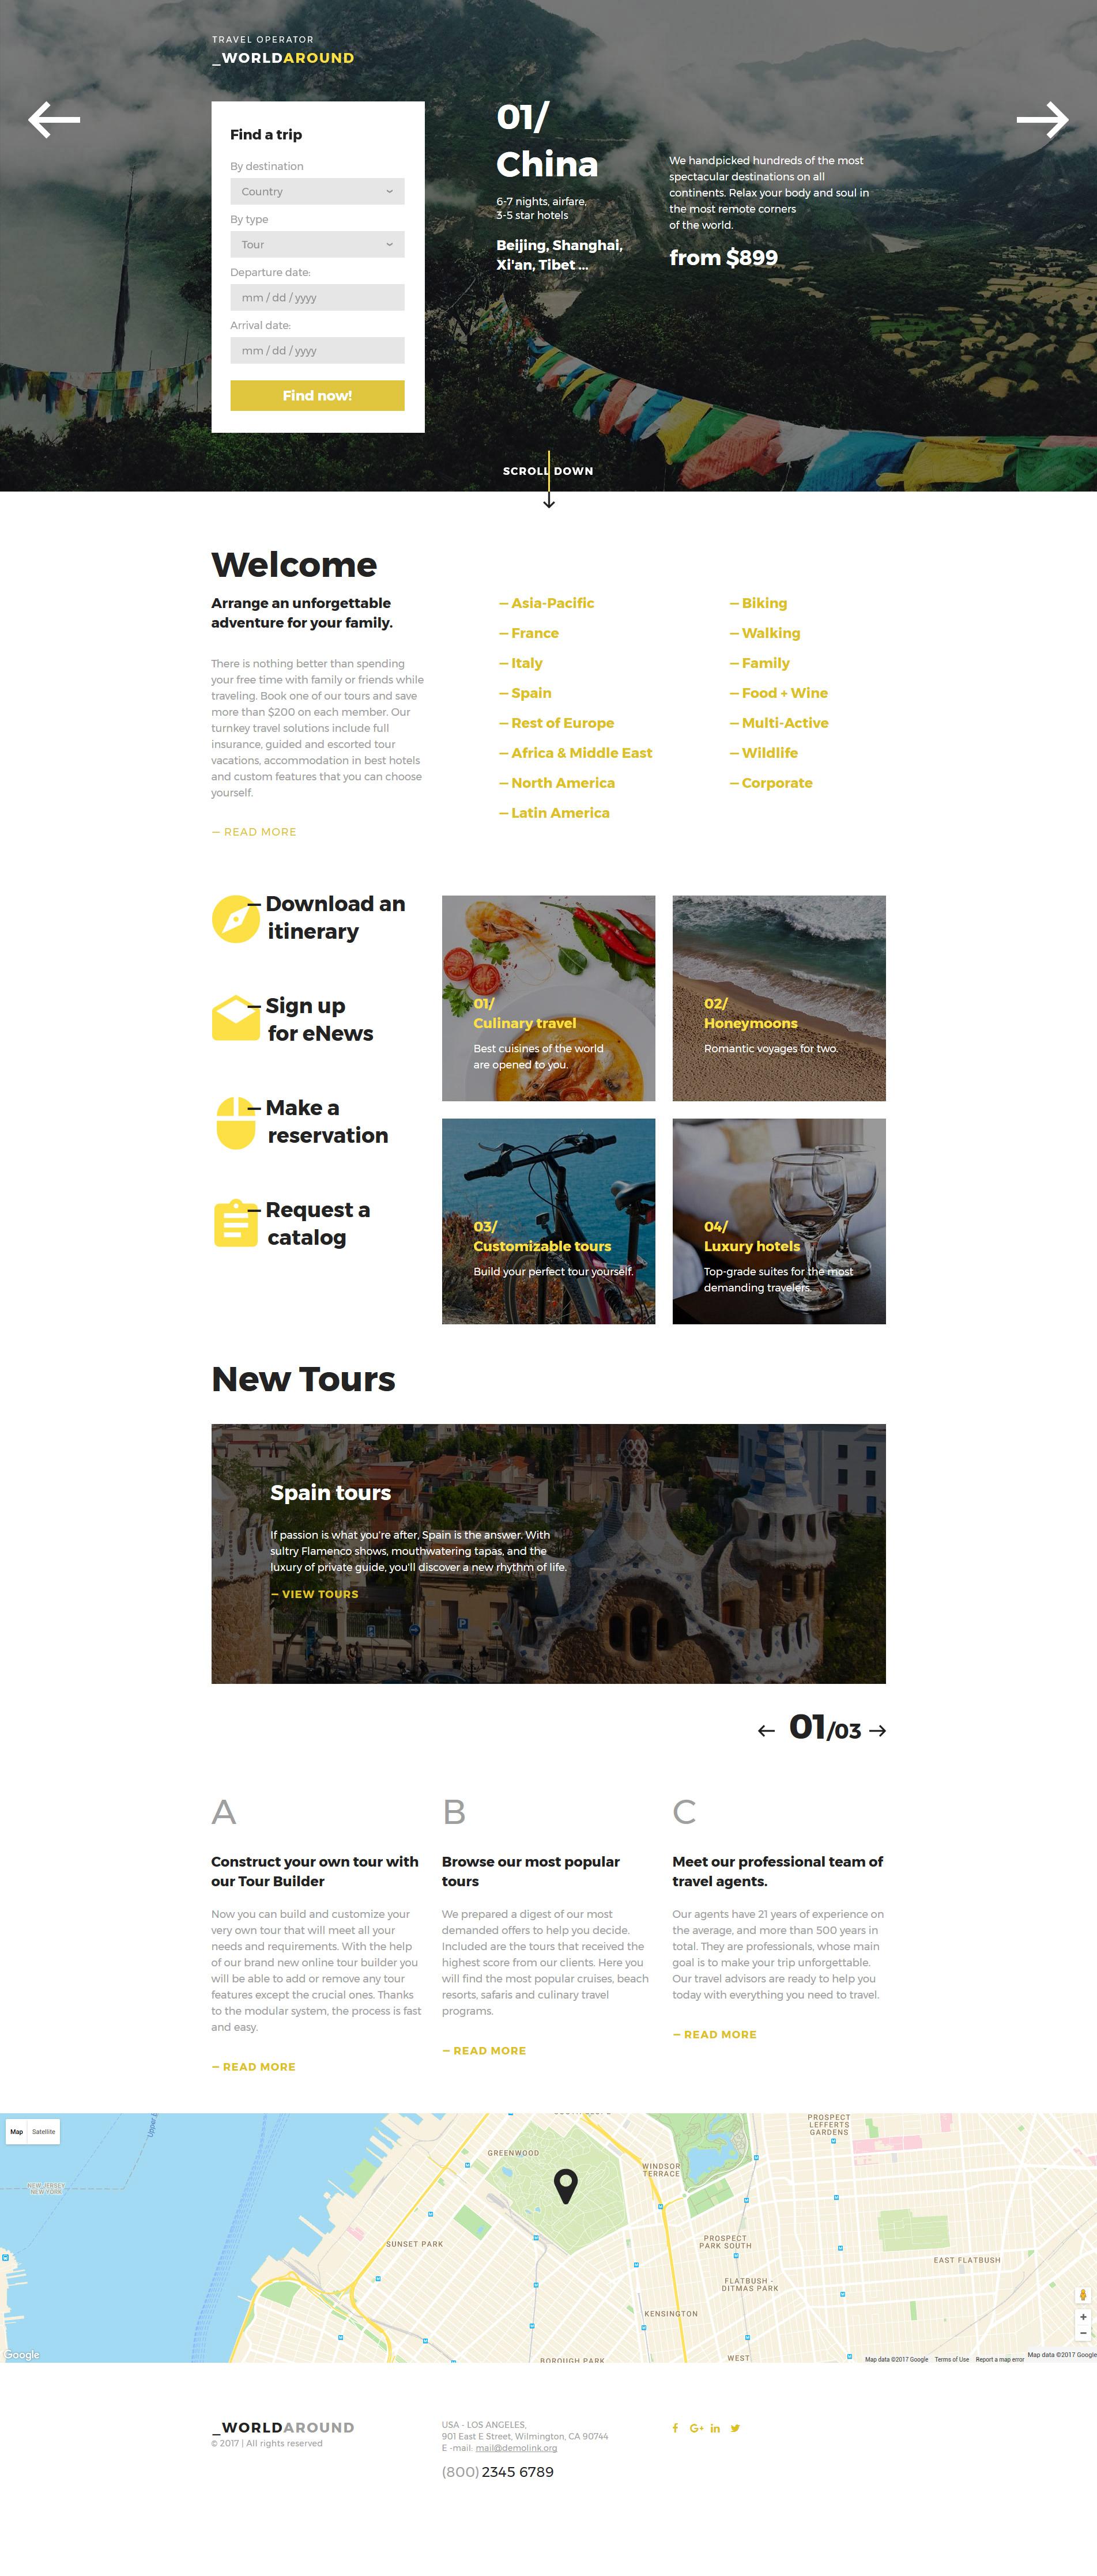 WorldAround - Travel Operator №58170 - скриншот